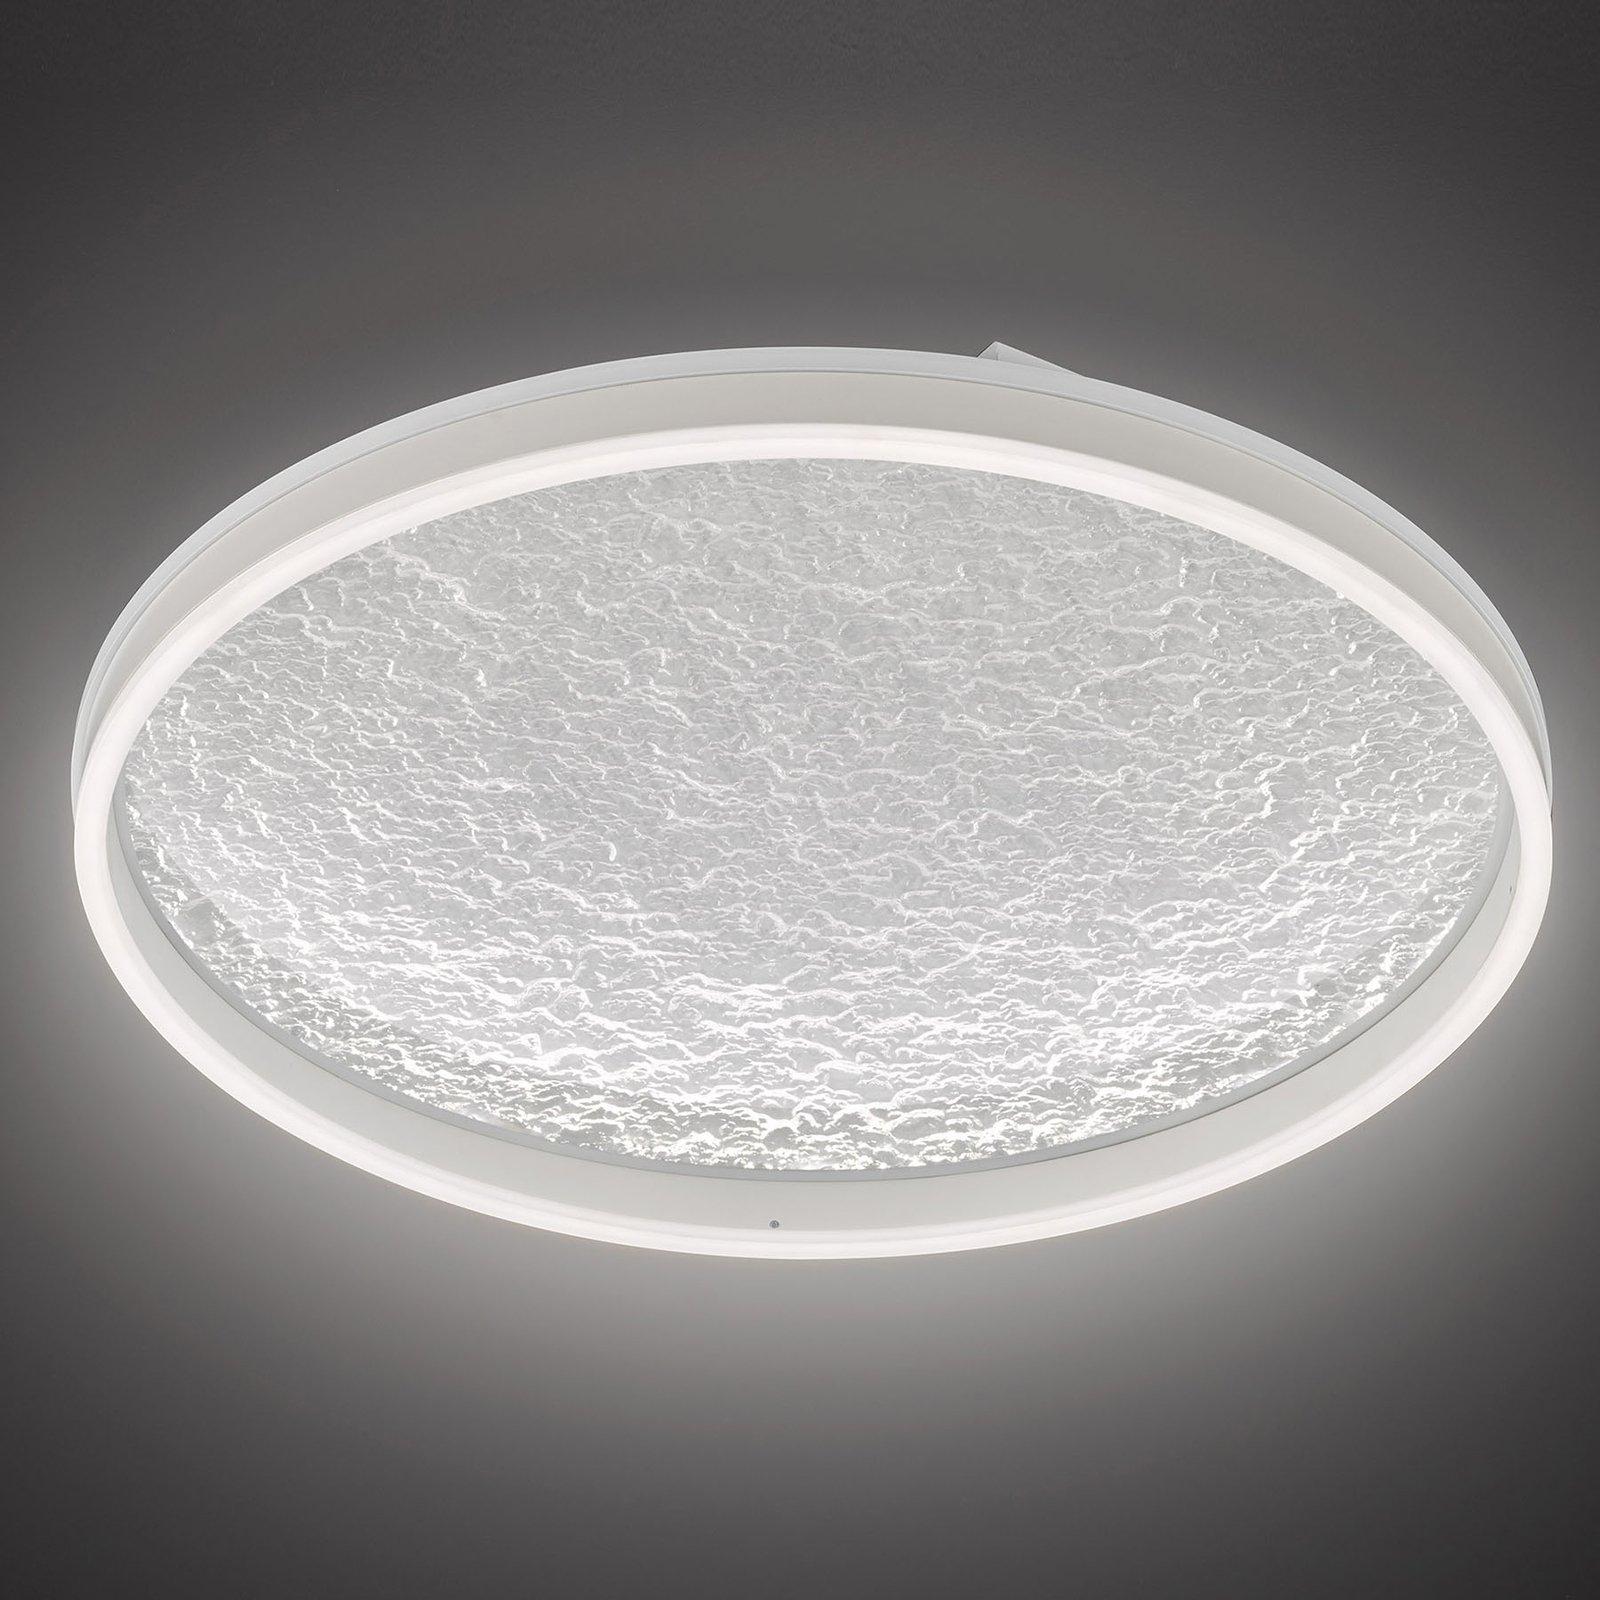 LED-taklampe Bali, dimbar, hvit, 60 cm